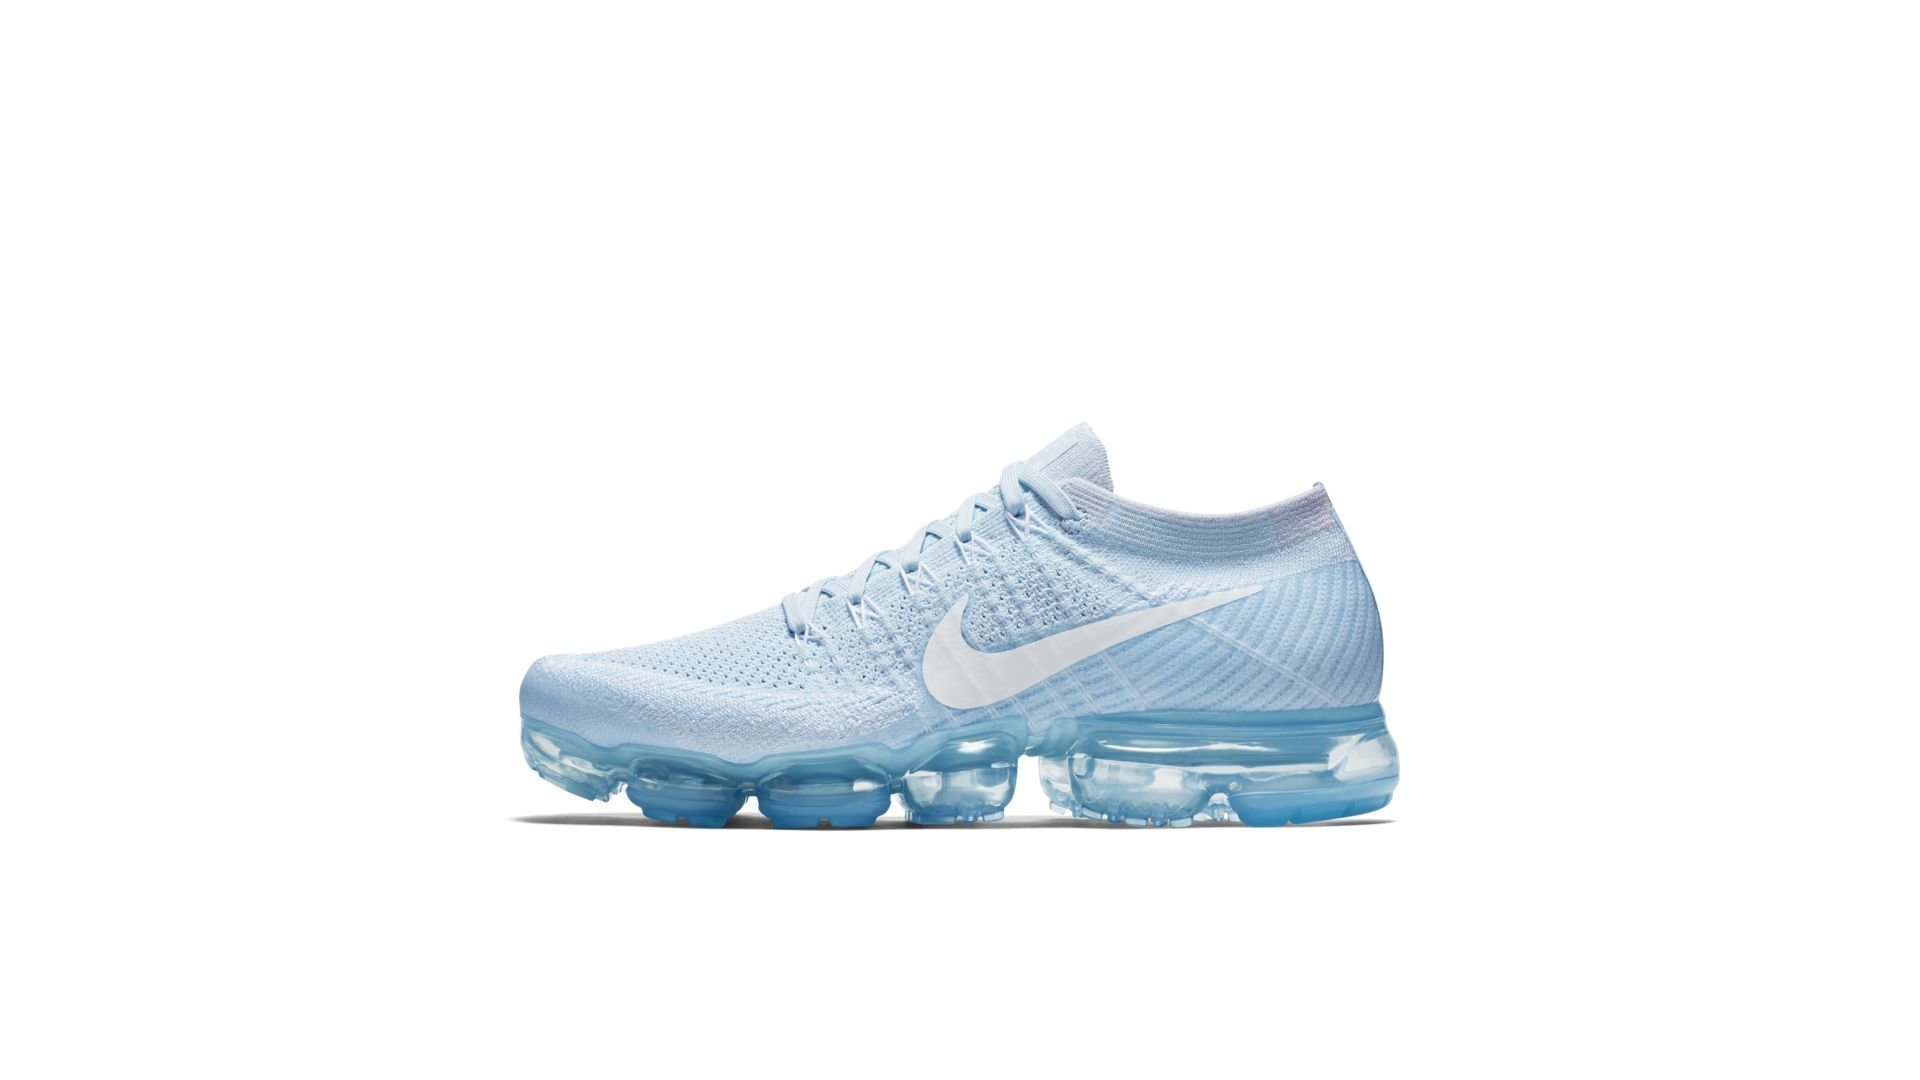 Nike Air Vapormax Glacier Blue (849558-404)